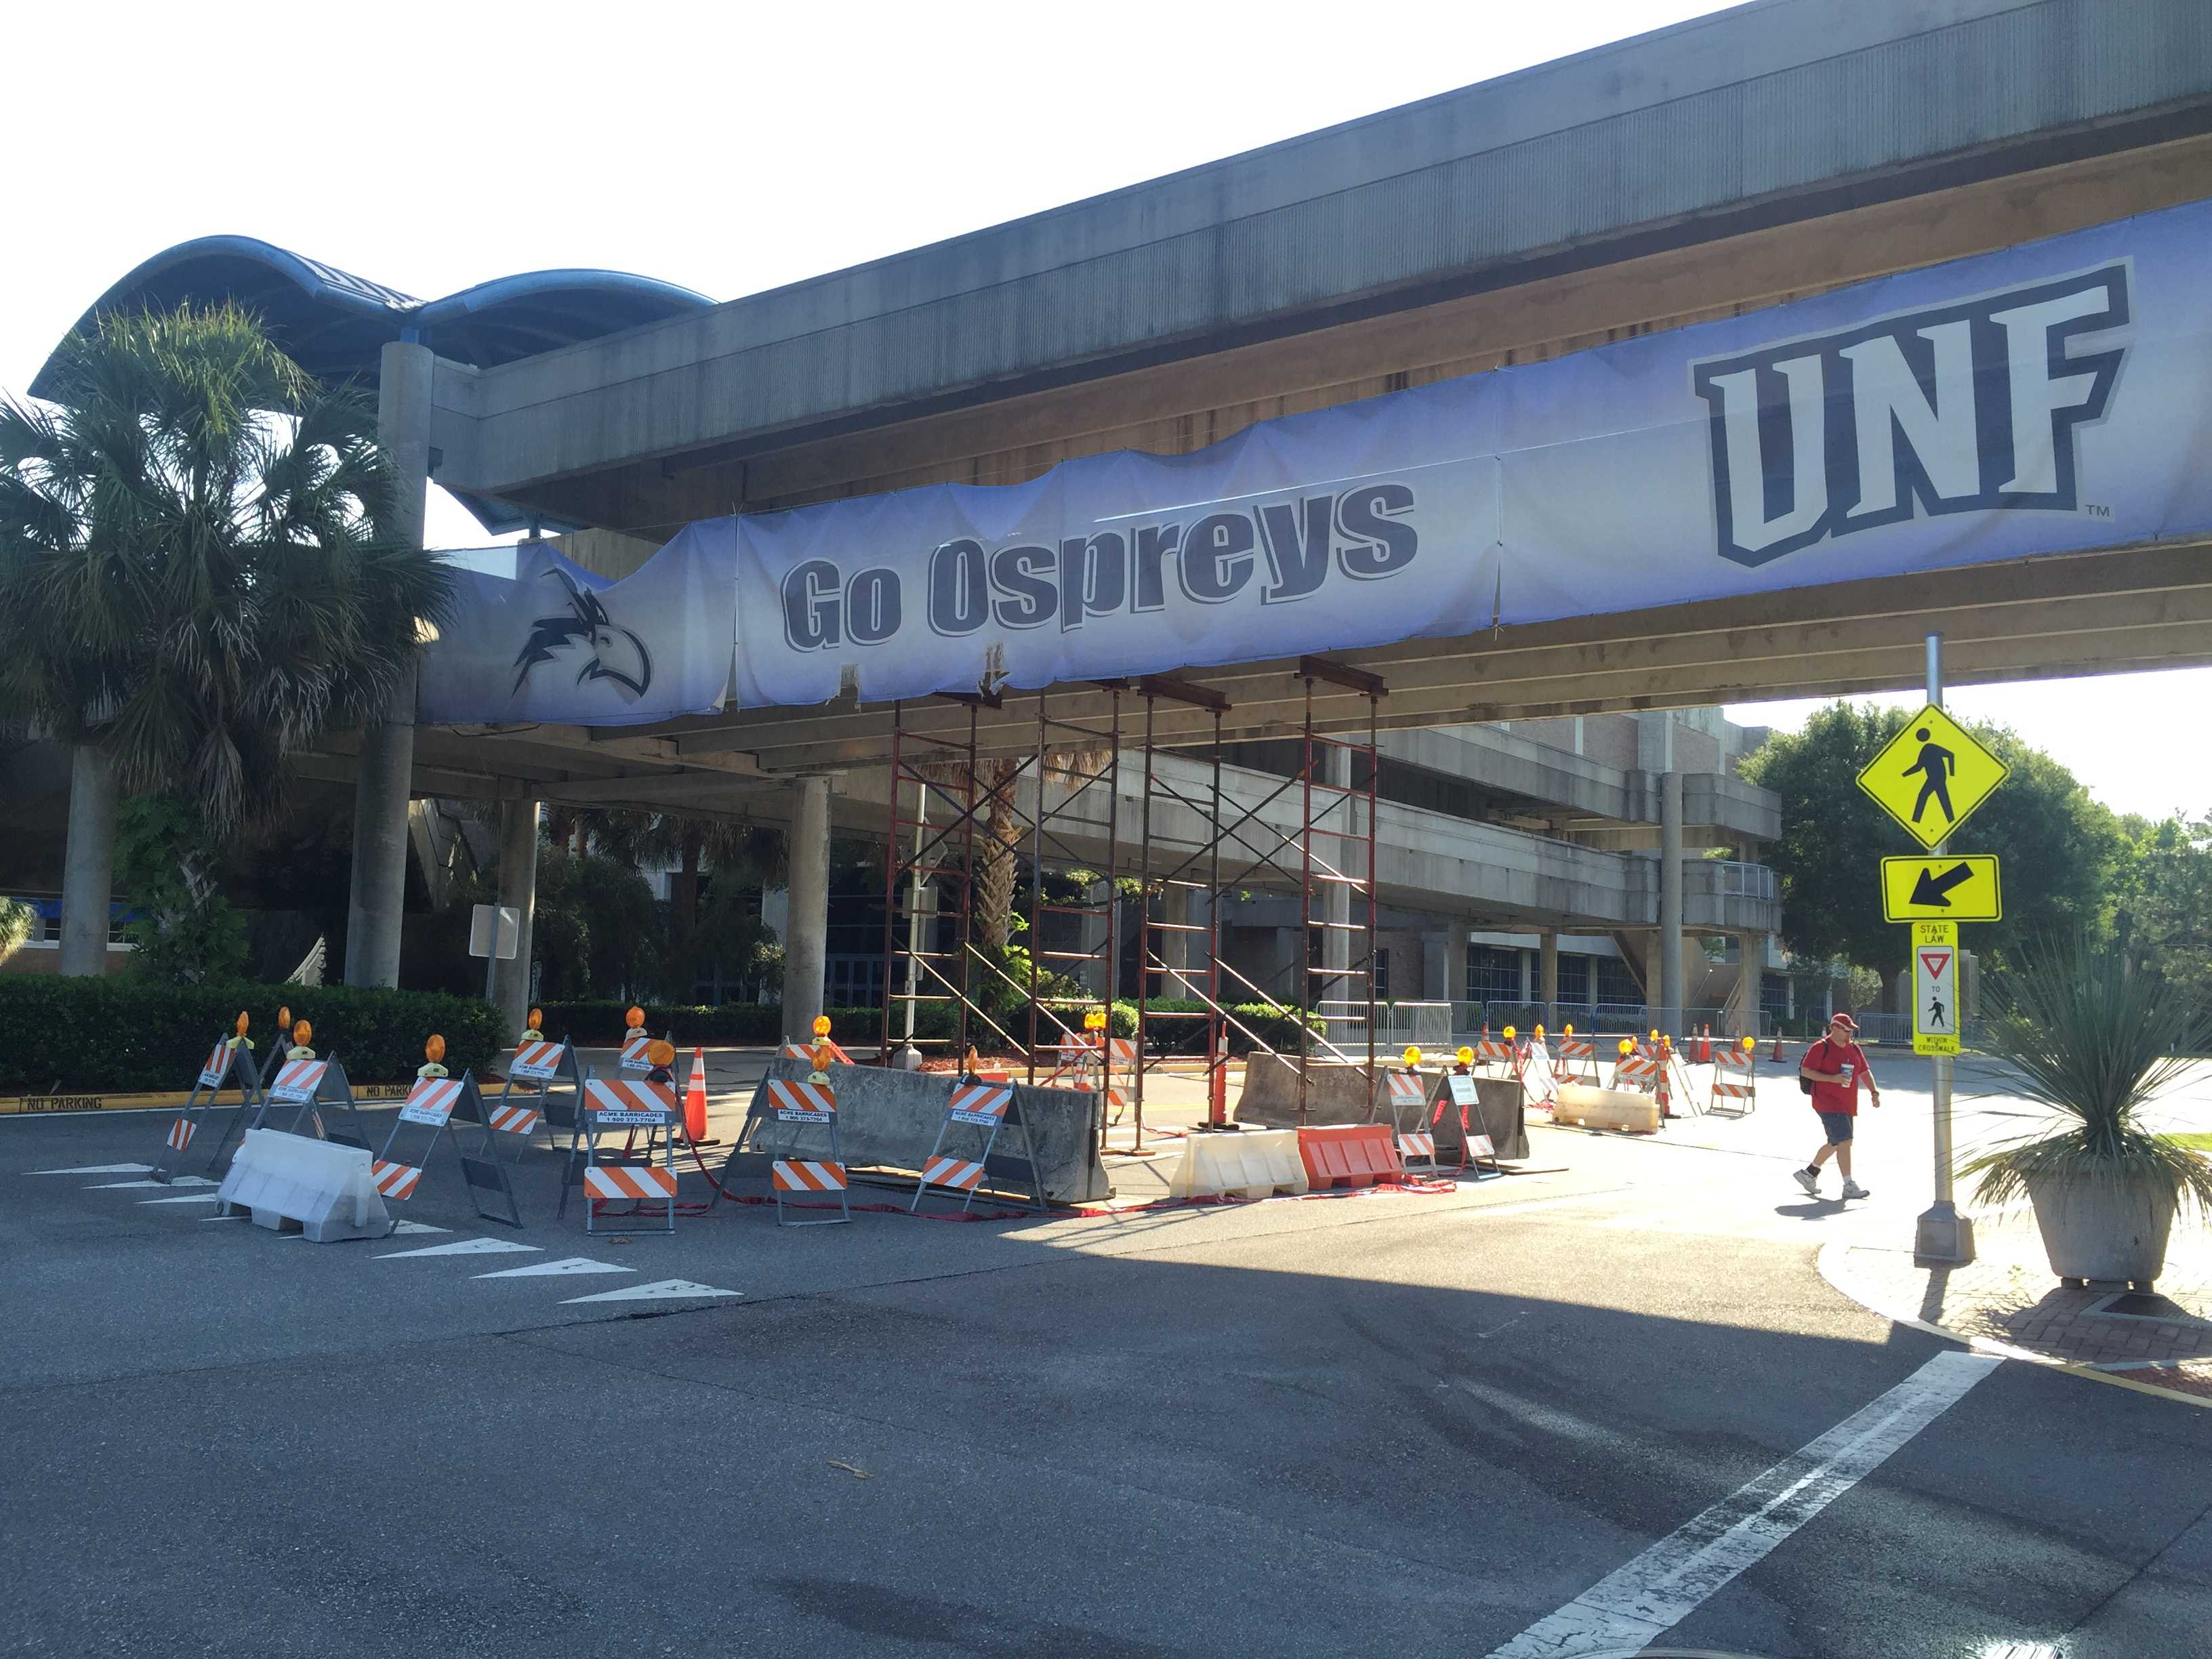 Arena walkway is coming down